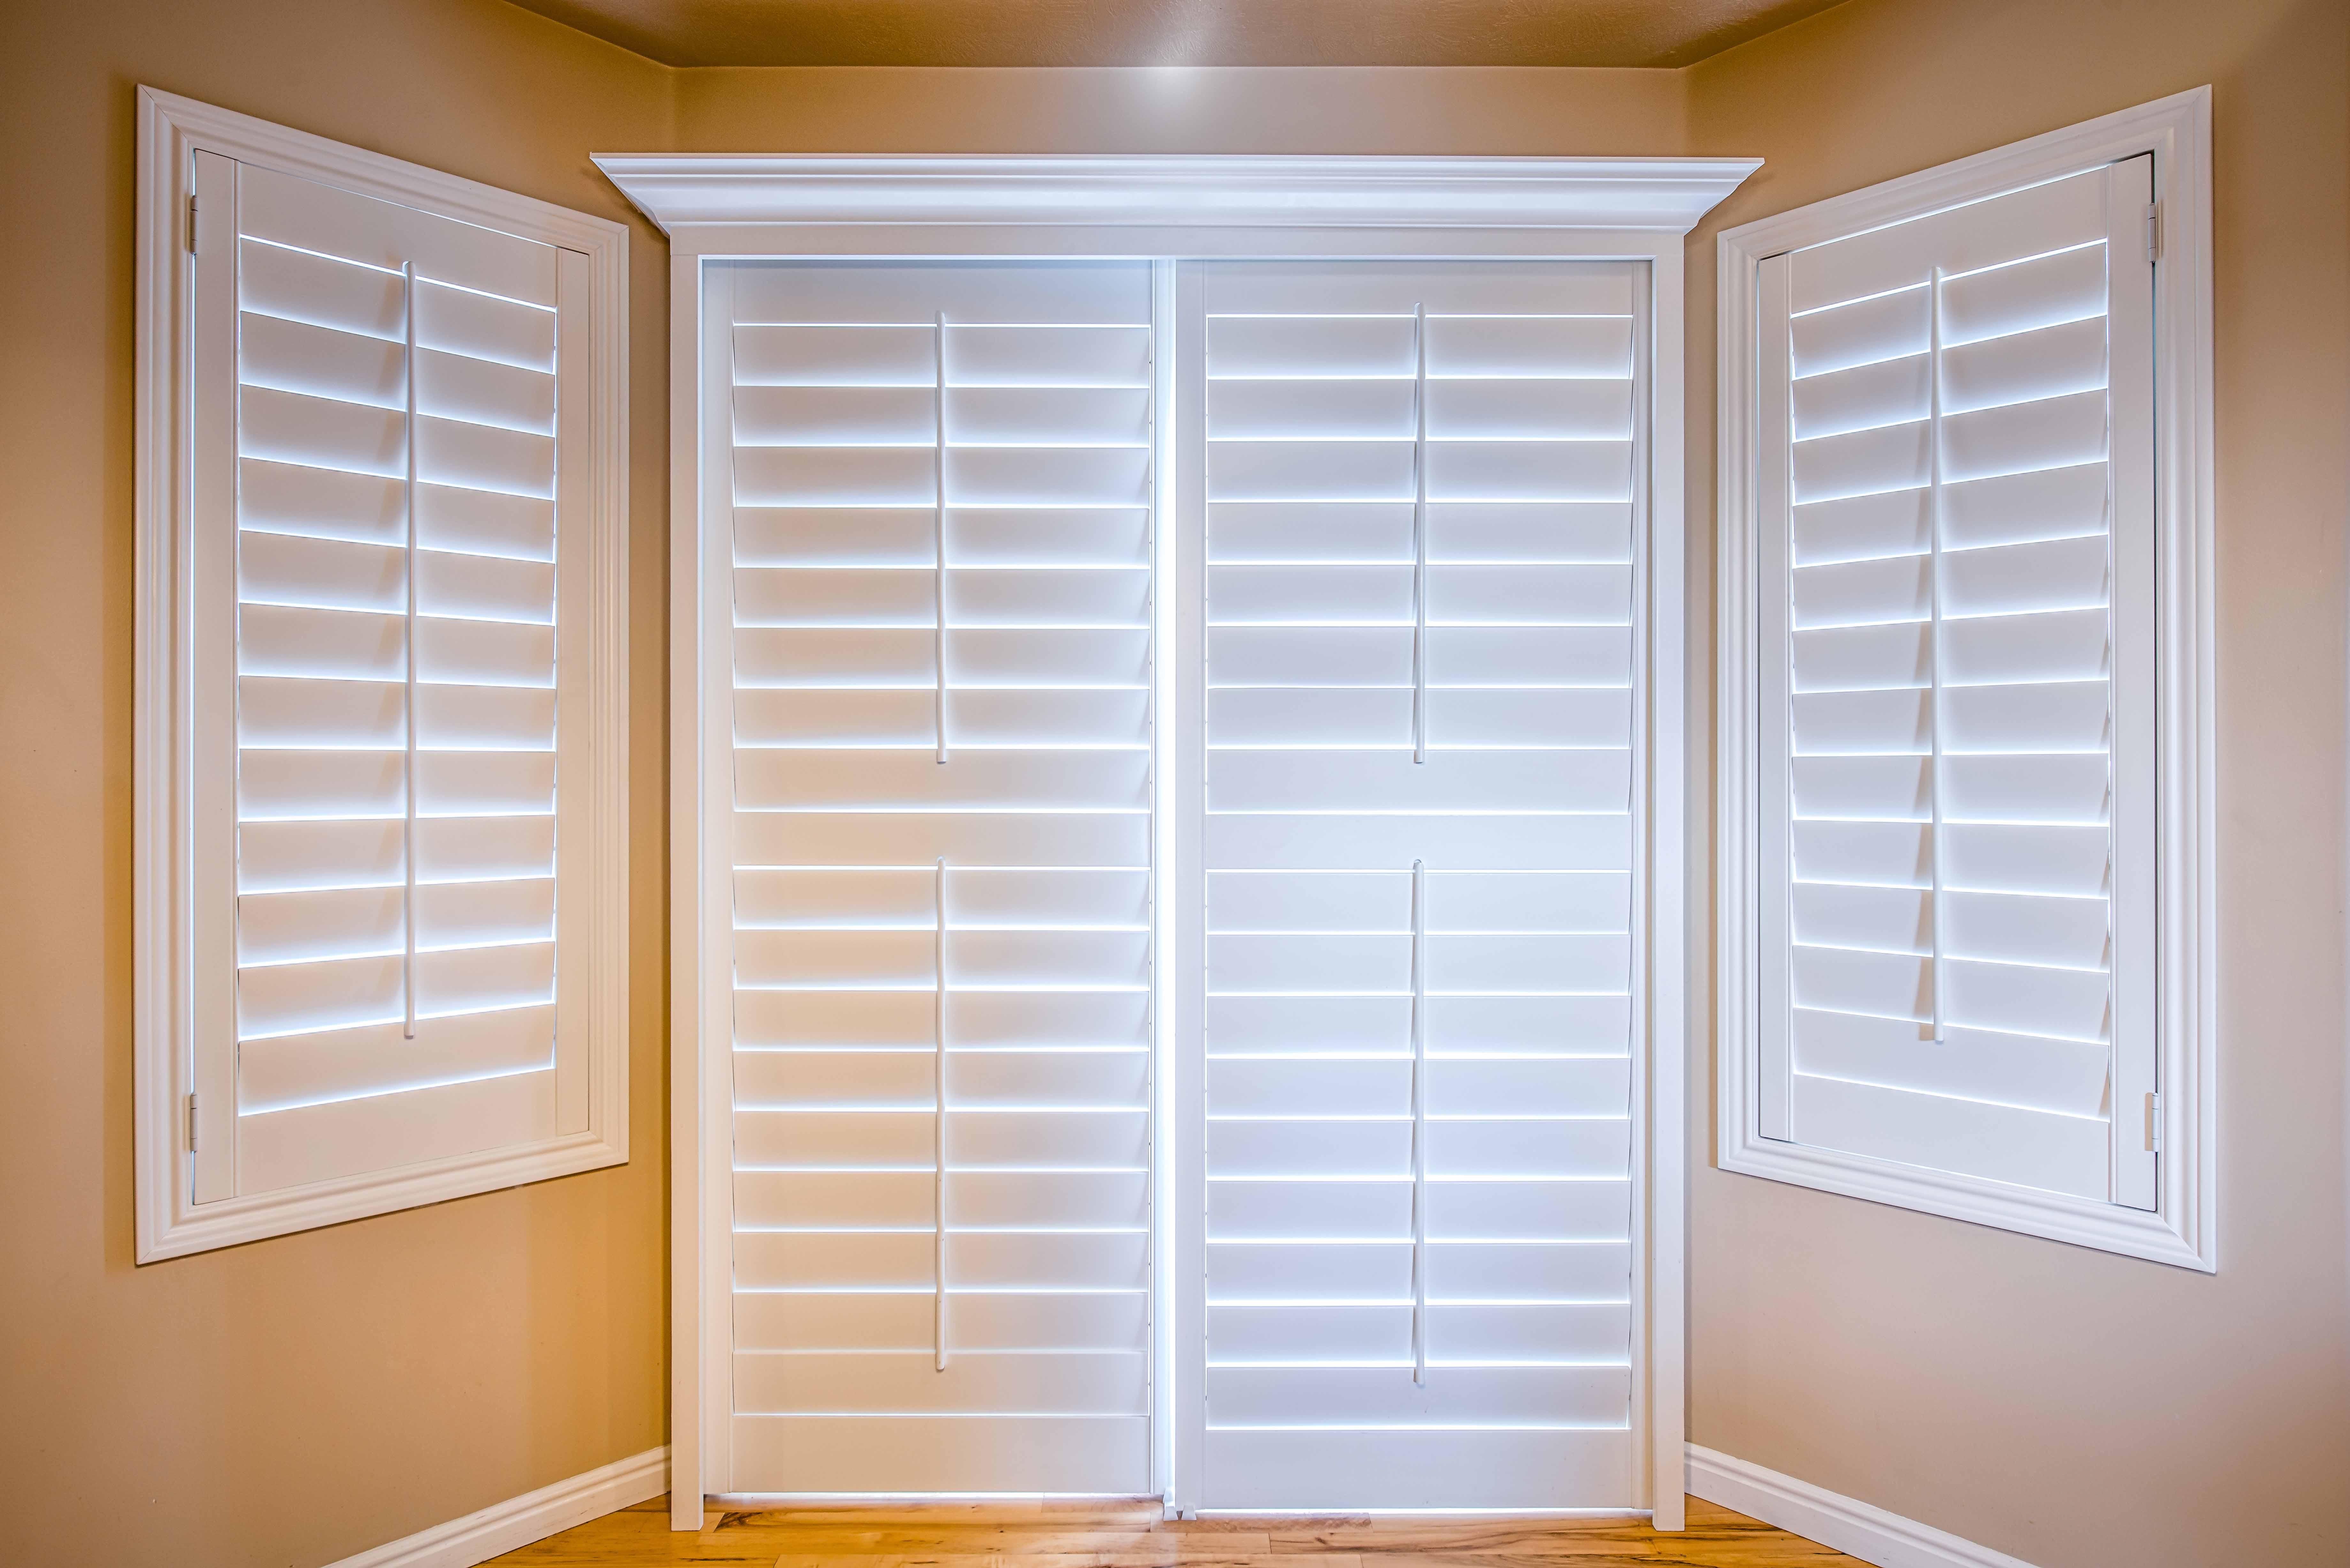 Interior shutters for sliding glass doors - Sliding Door Plantation Shutters